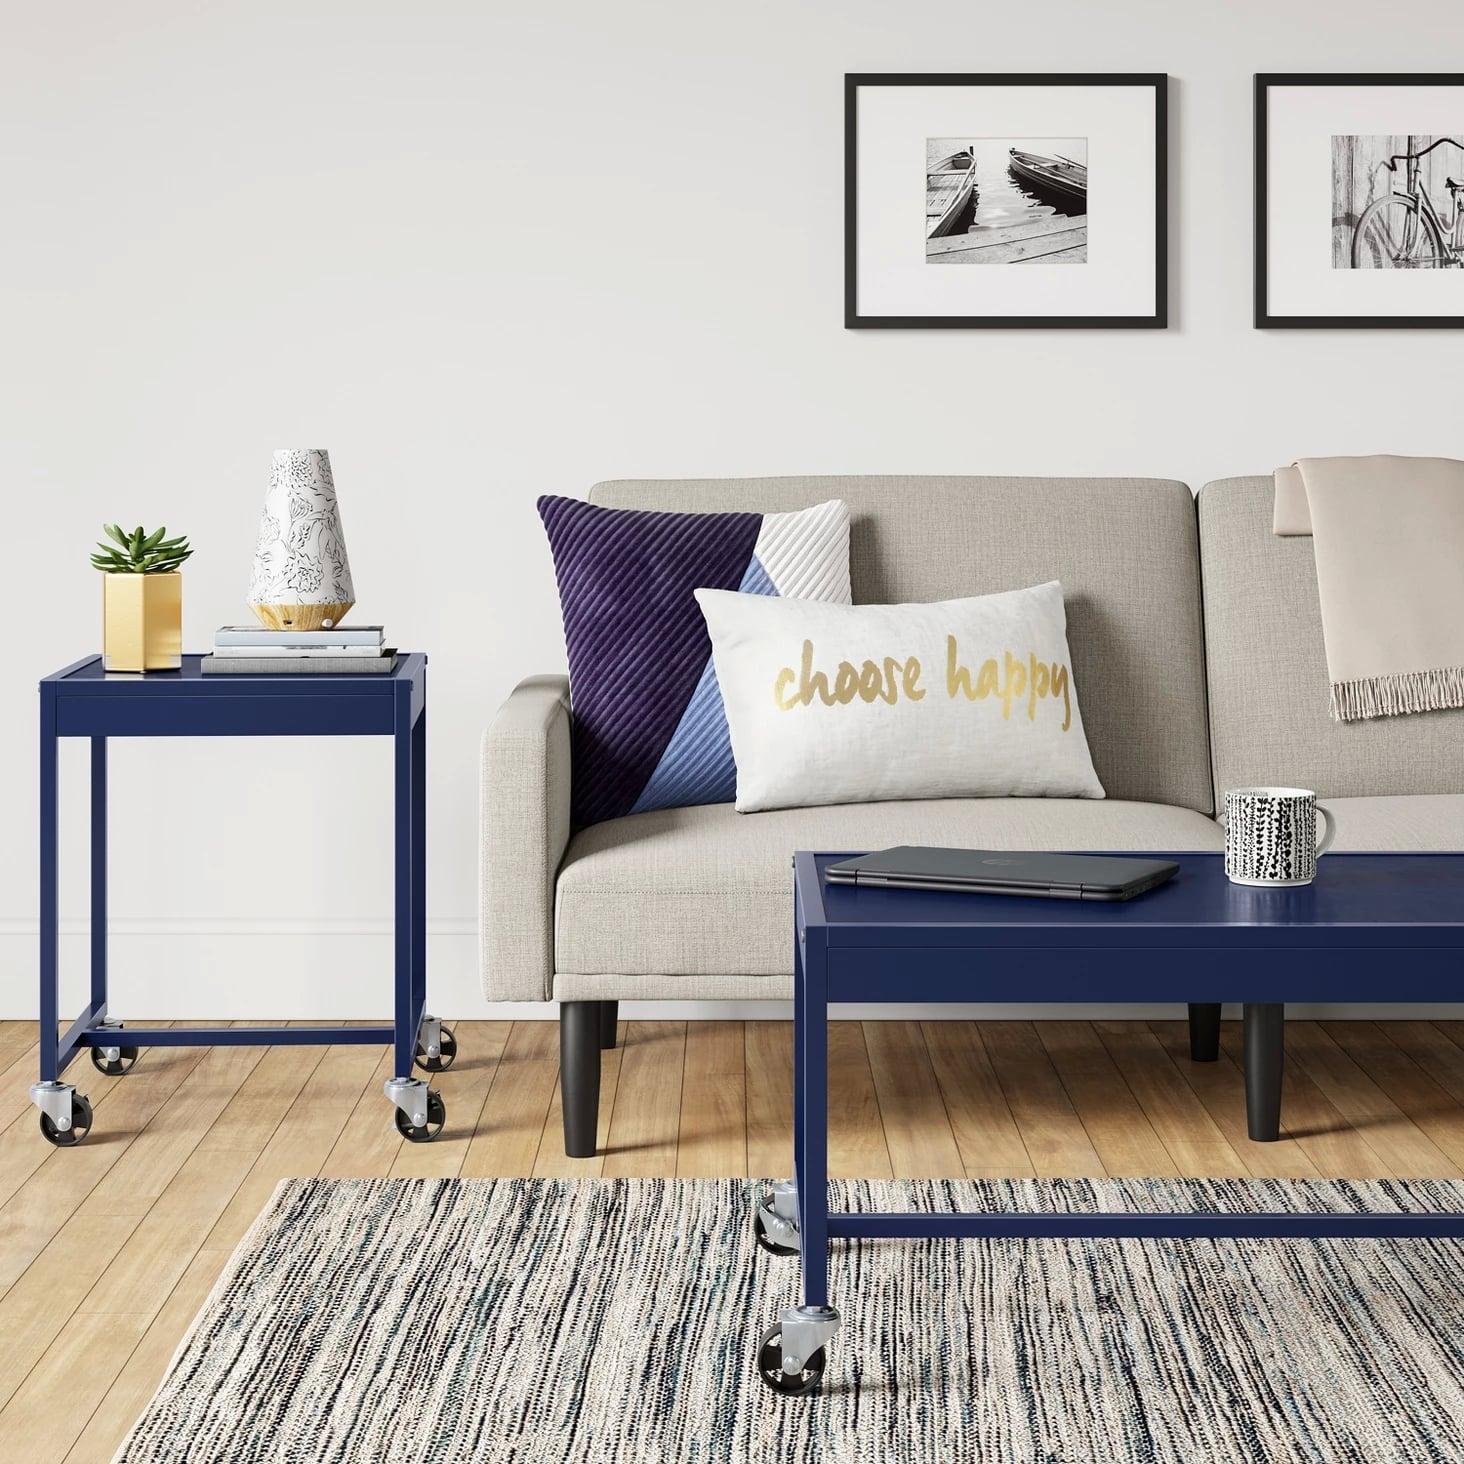 Metal Accent Table In Navy Best Target Furniture Under 50 Popsugar Home Australia Photo 20